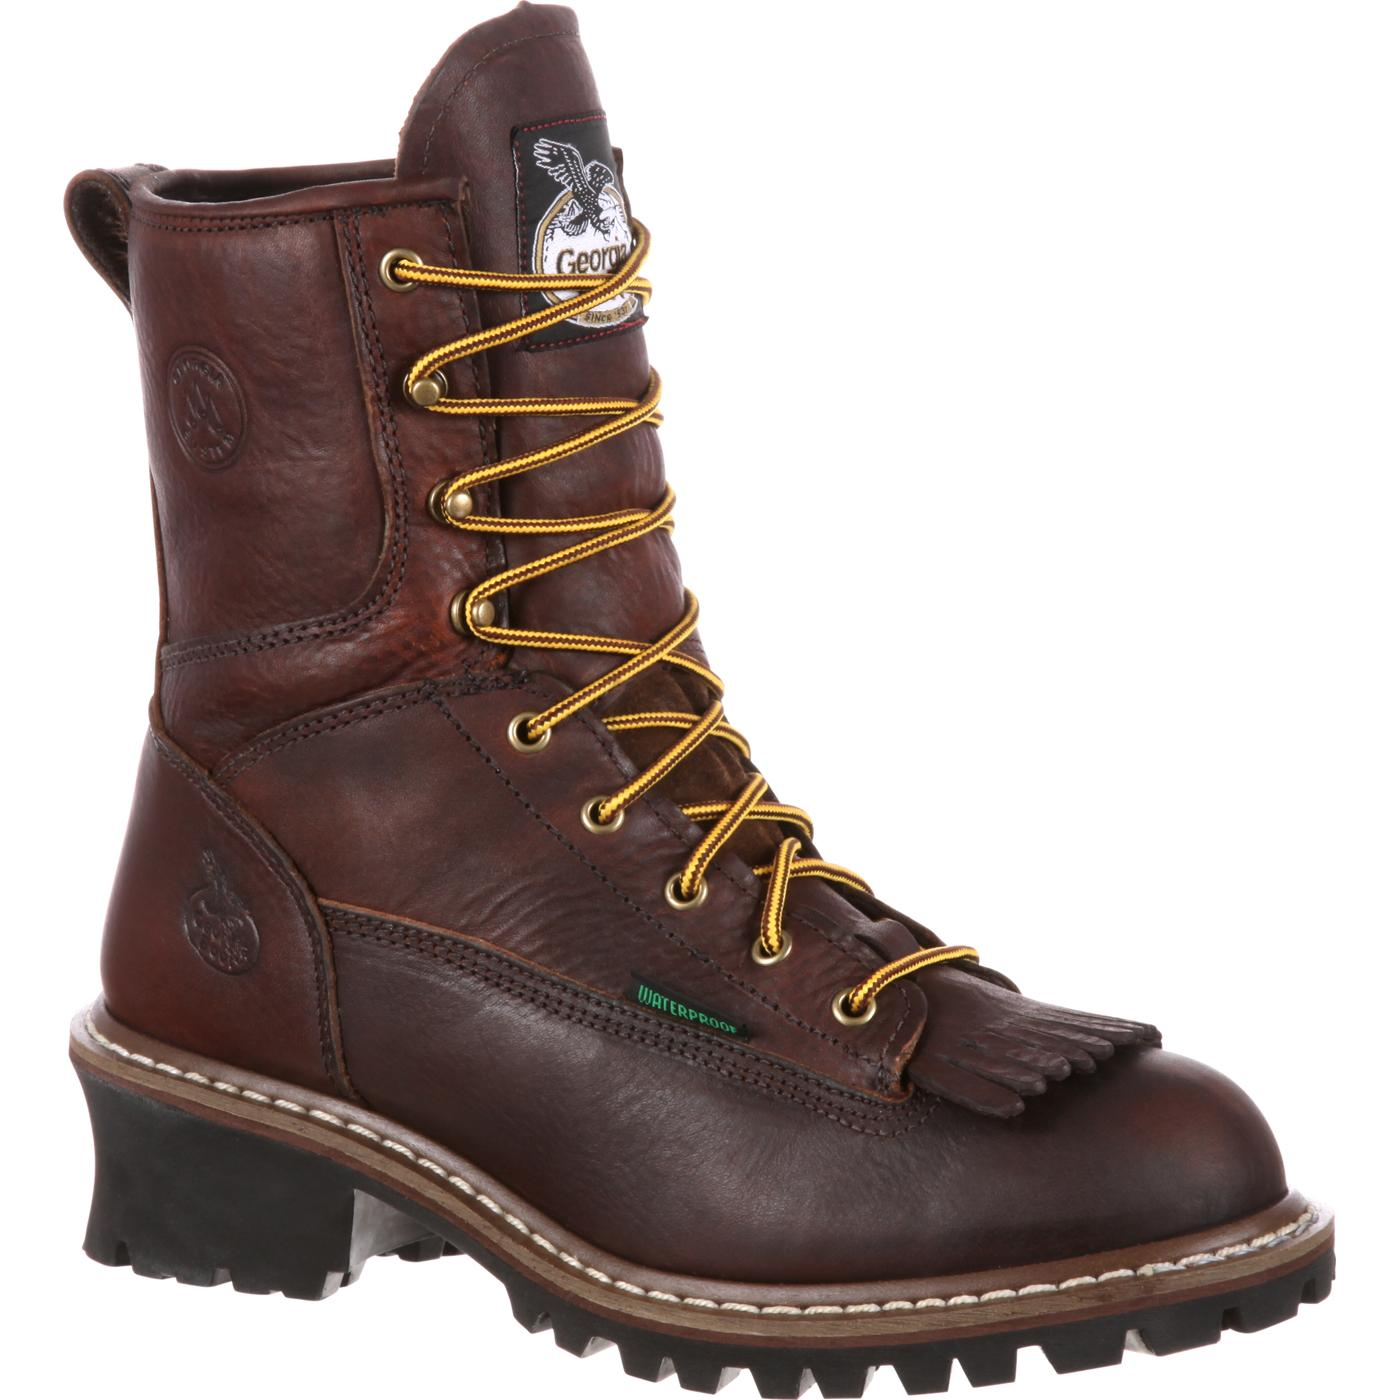 Georgia Boot Steel Toe Waterproof Logger Boots G7313